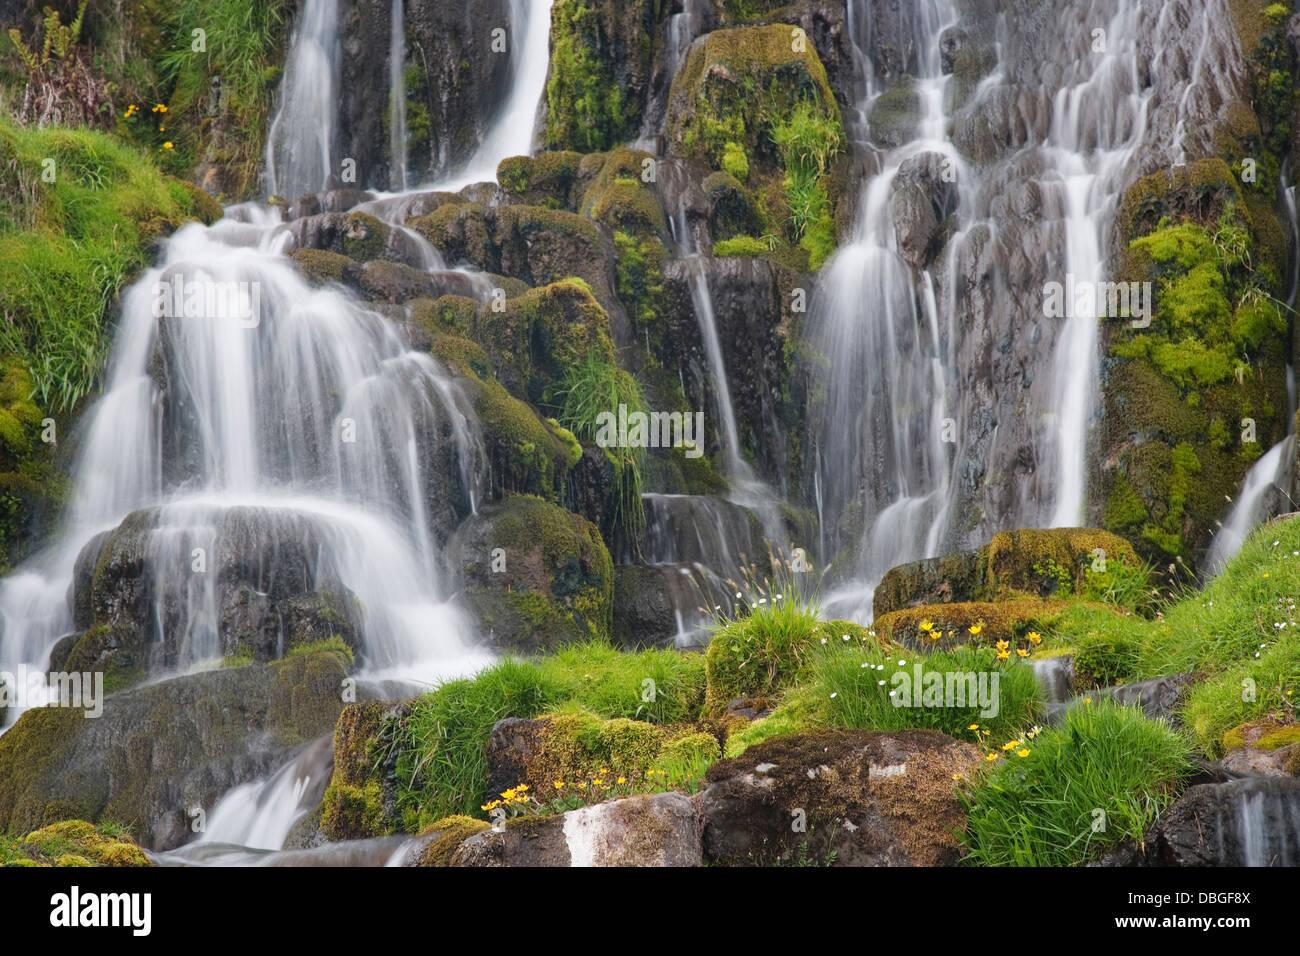 Waterfall with moss and flowers Isle of Skye, Inner Hebrides Scotland, UK LA006357 - Stock Image